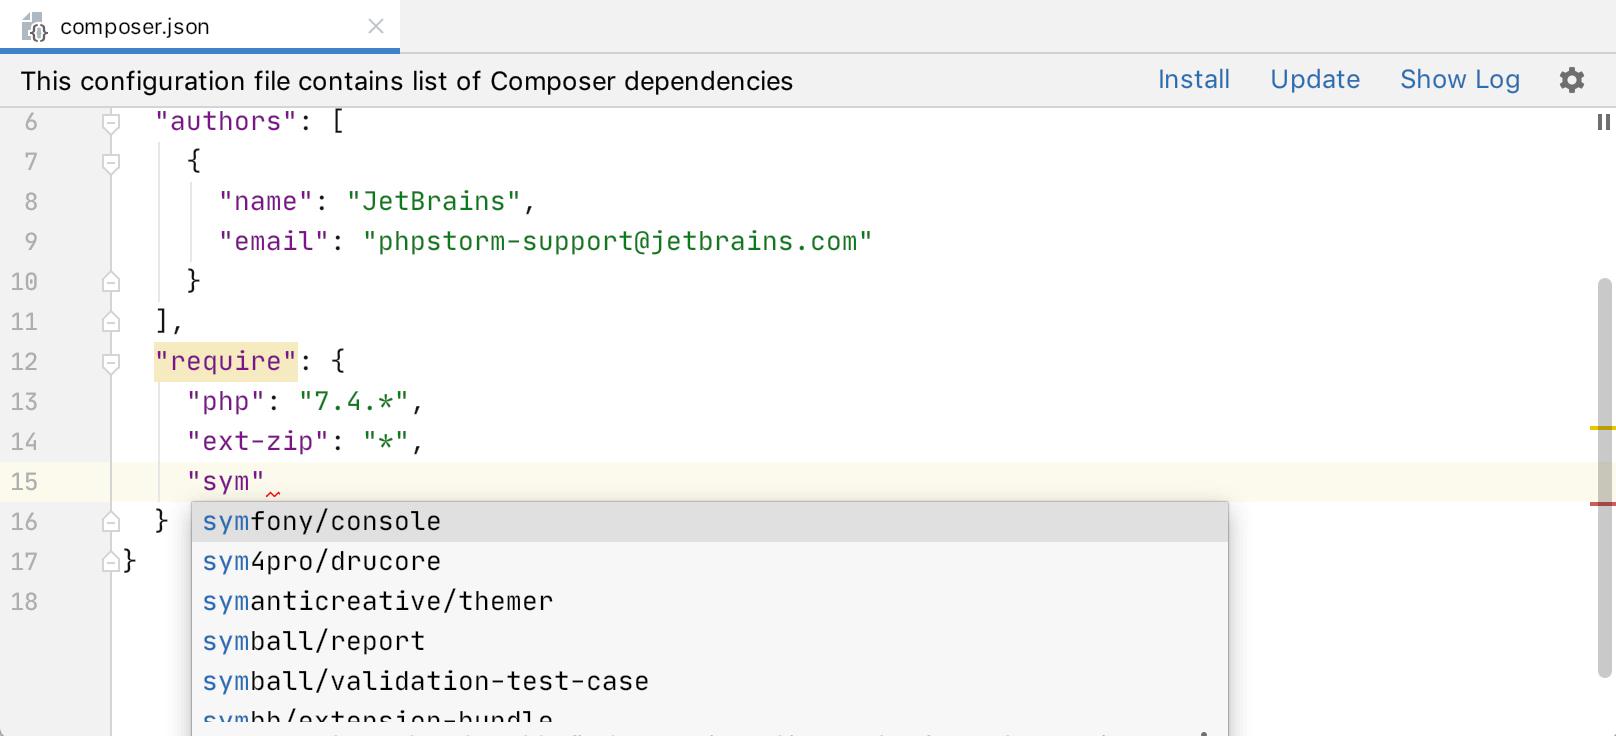 composer-json_manage_dependencies@2x